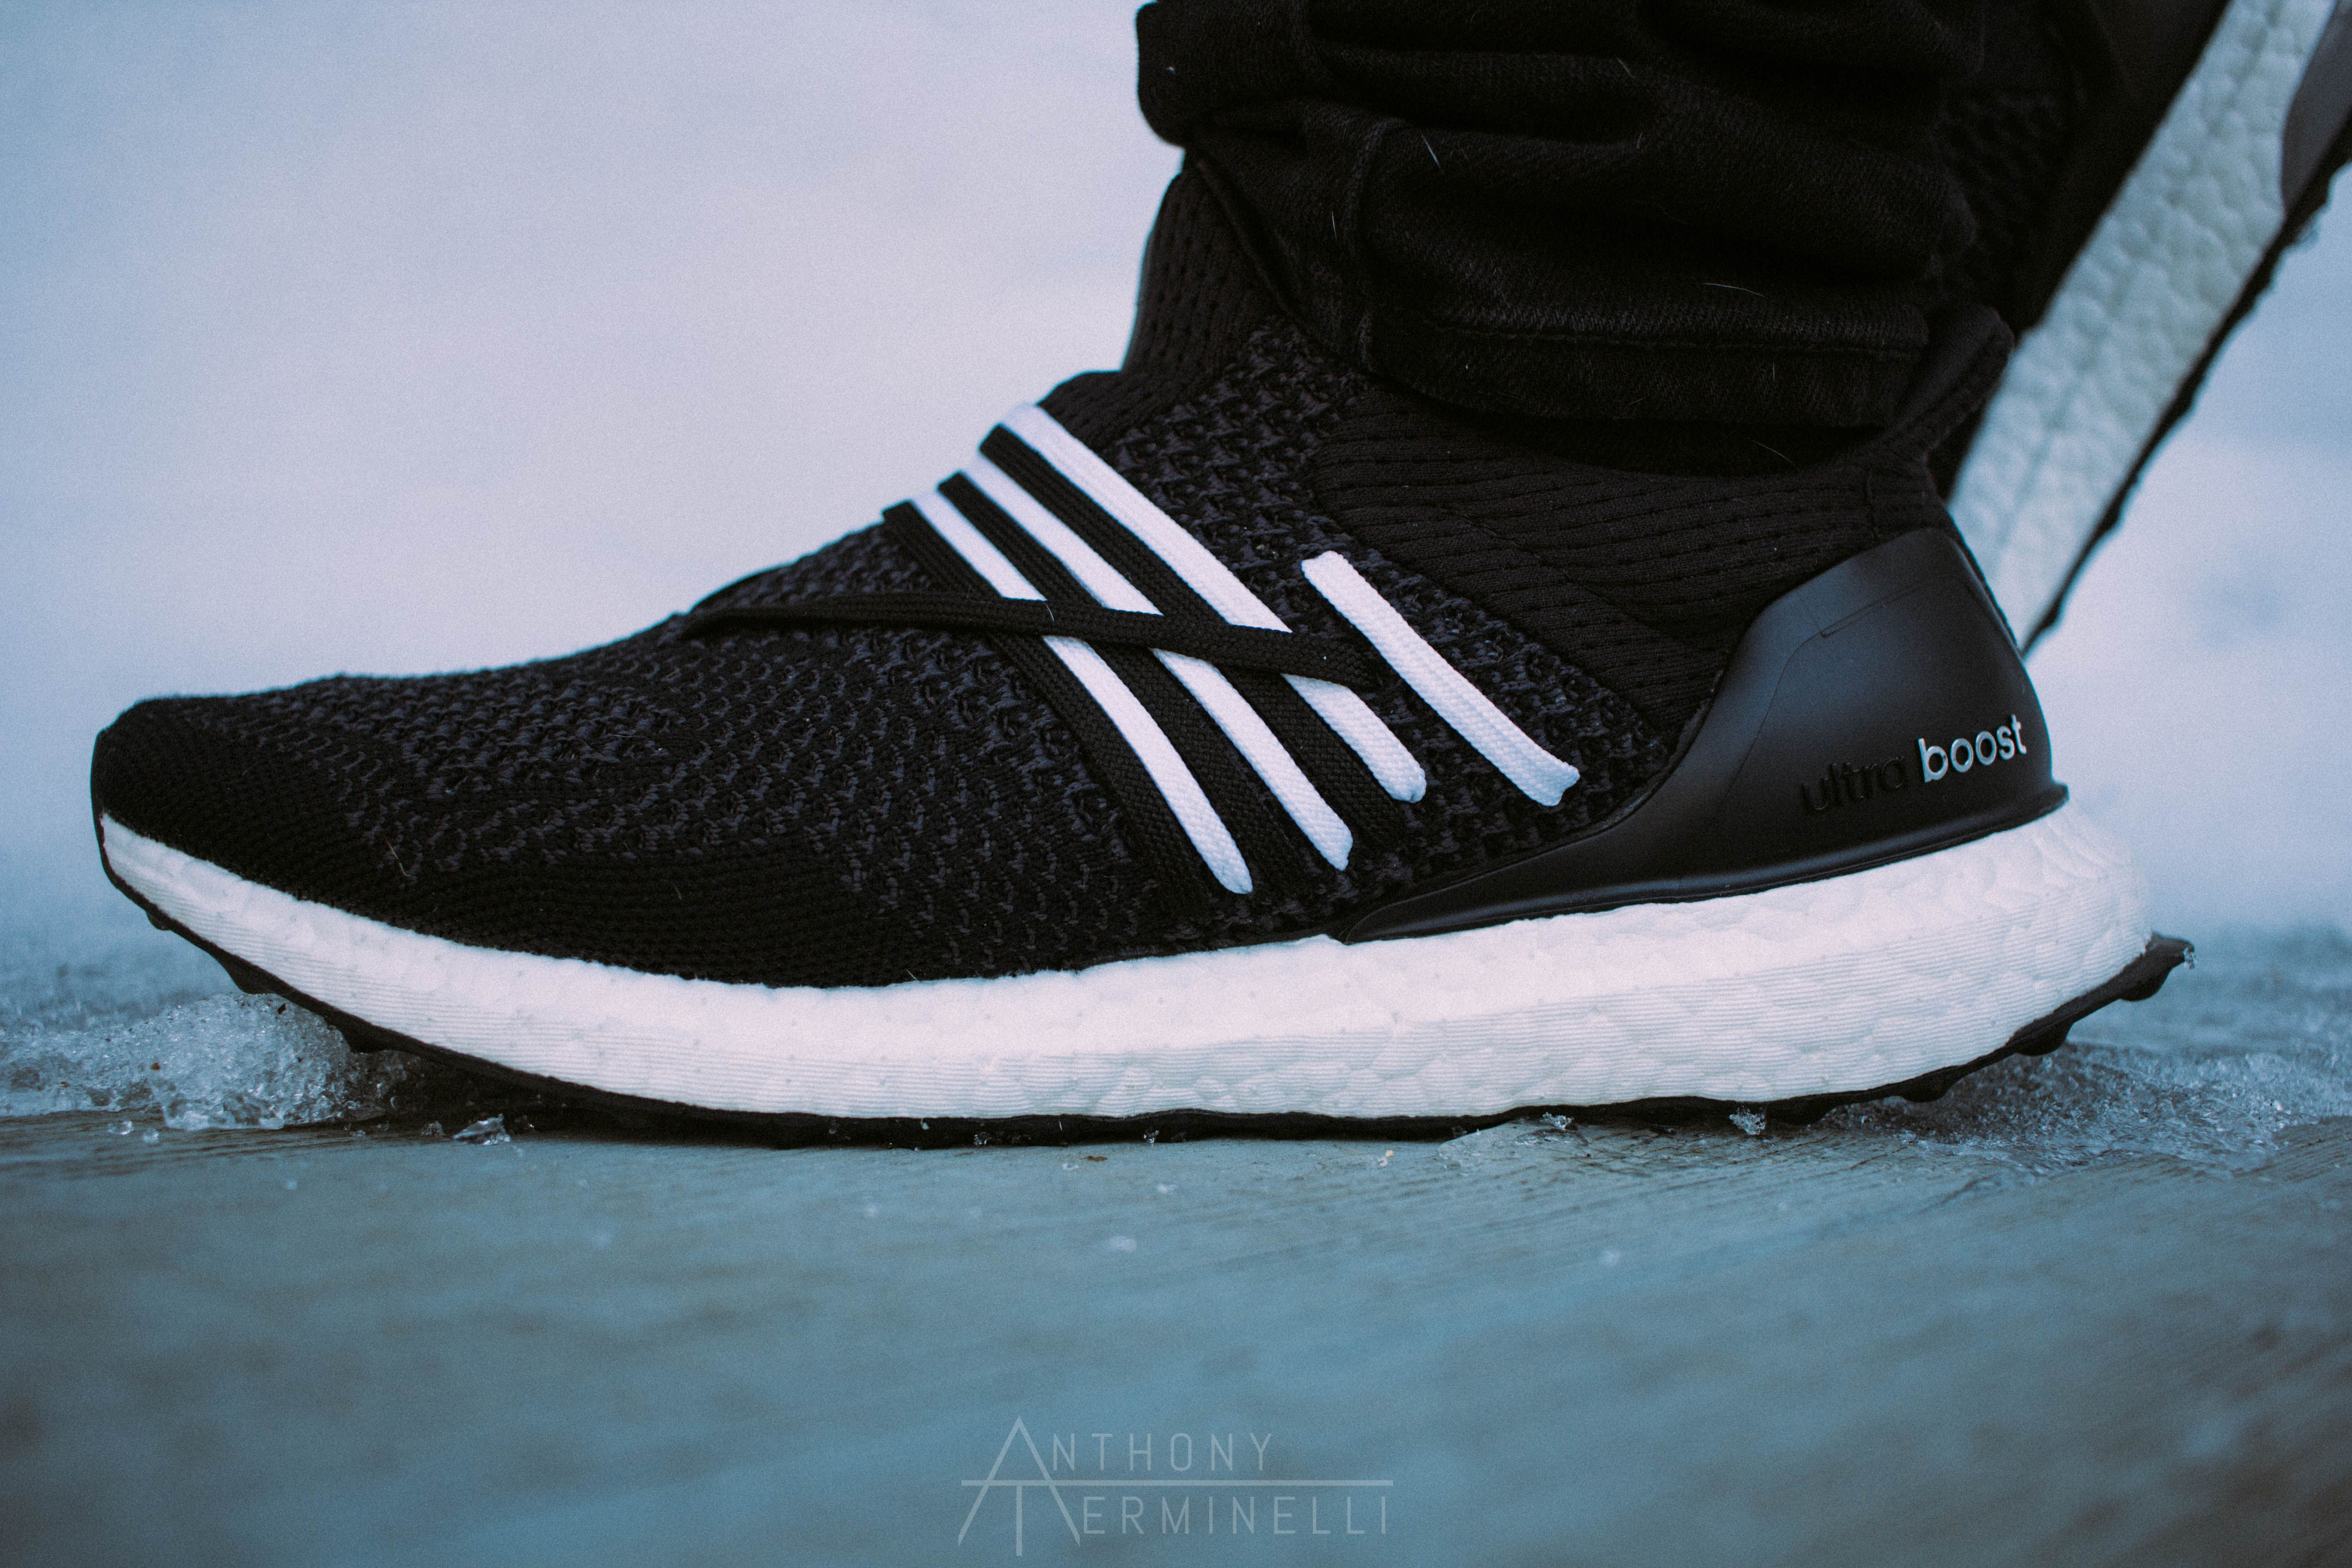 adidas-ultra-boost-custom-3d-printed-cage-solesclusive-maskulin-1.jpg  (620×446) | Footwear | Pinterest | Footwear